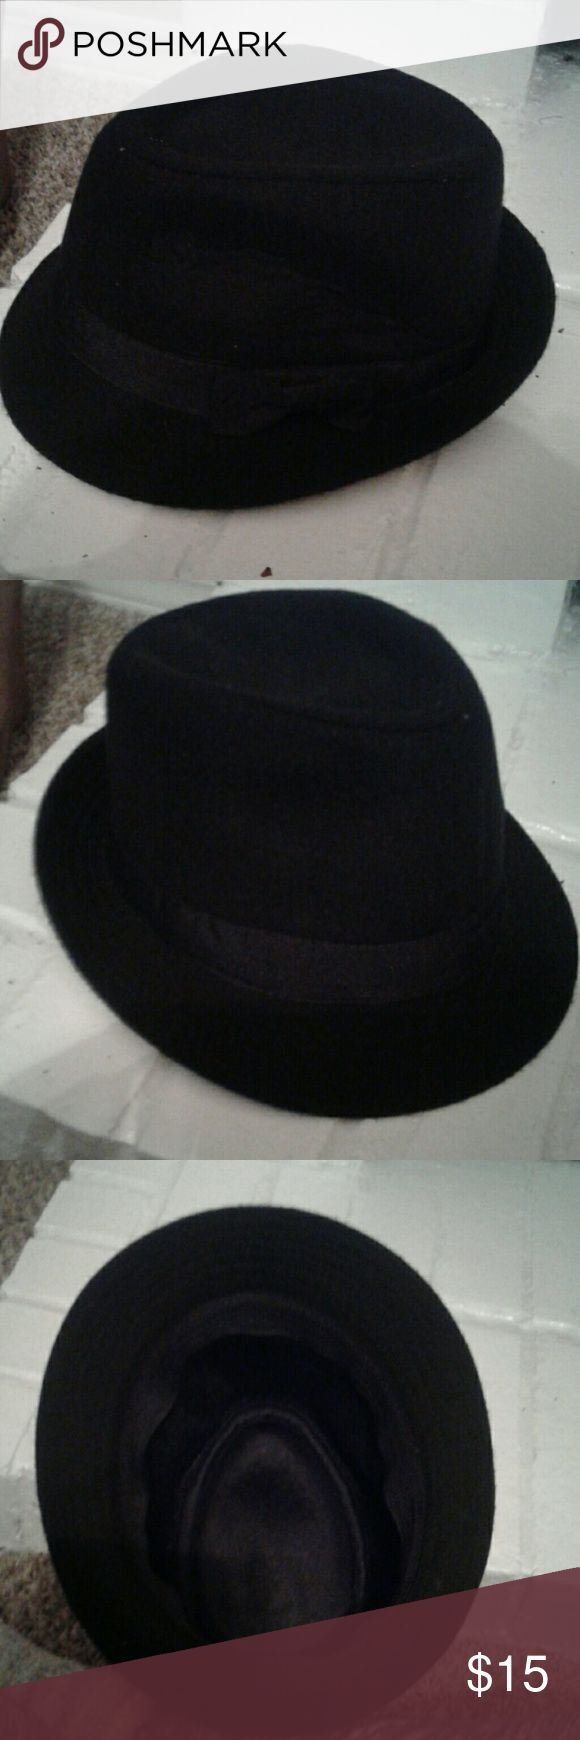 Black Fedora Hat Black Fedora Hat Accessories Hats